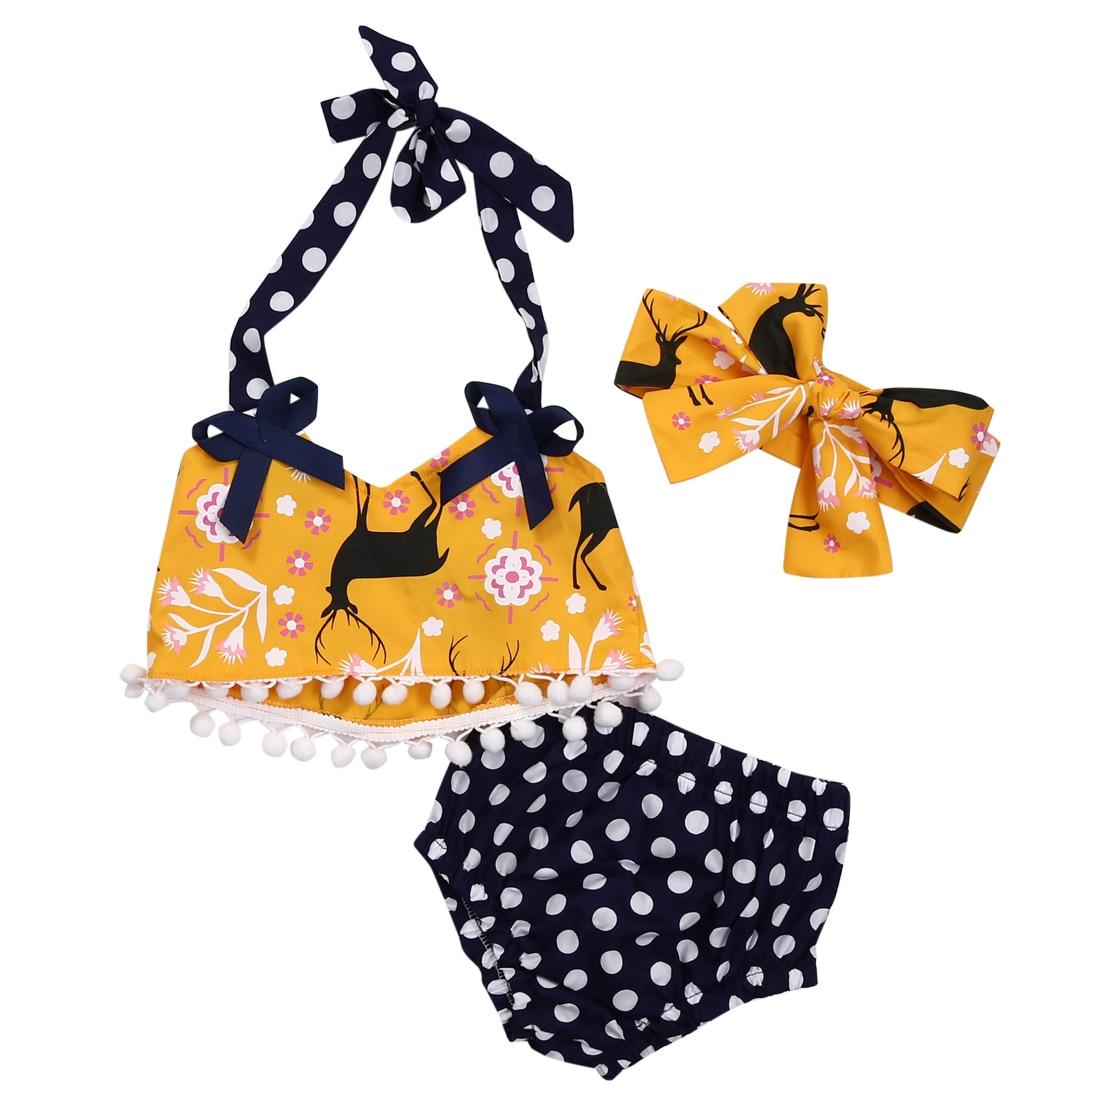 Newborn Baby Girl Clothes 3 Pcs Set Infant Kids Cute Bowknot Tank Tops + Polka Dots Shorts+Headband Outfits